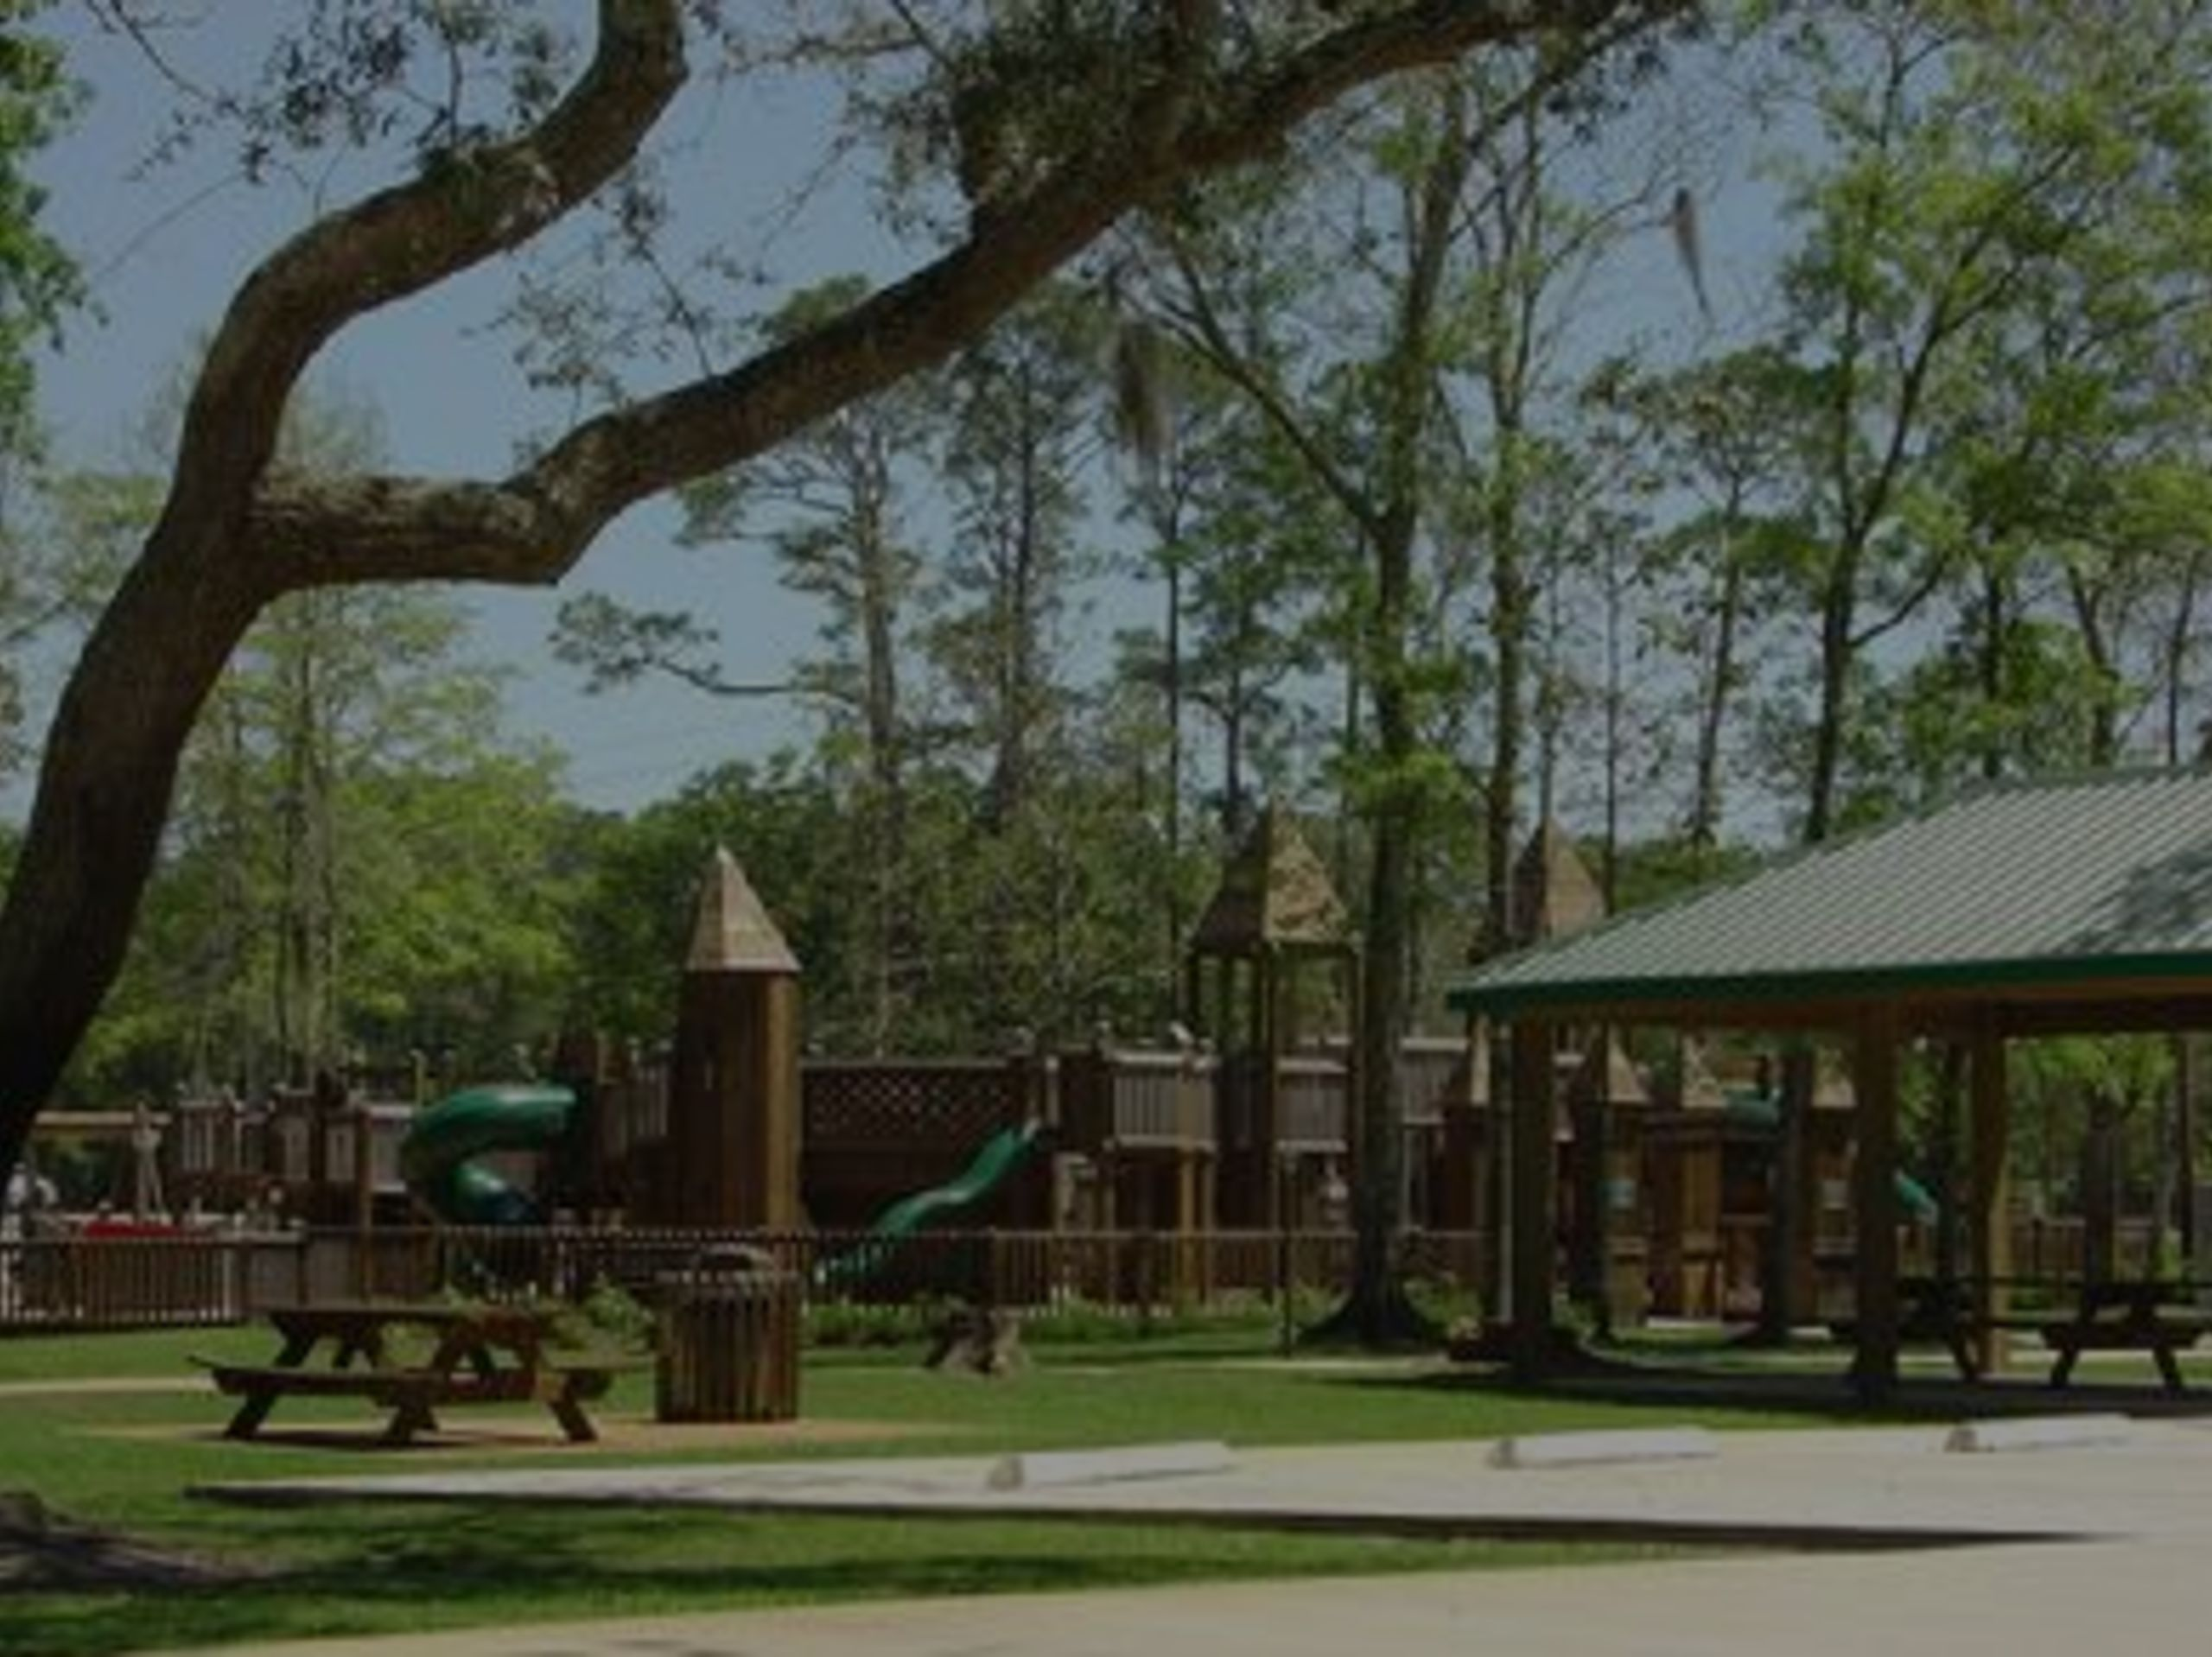 Parks in Baldwin County